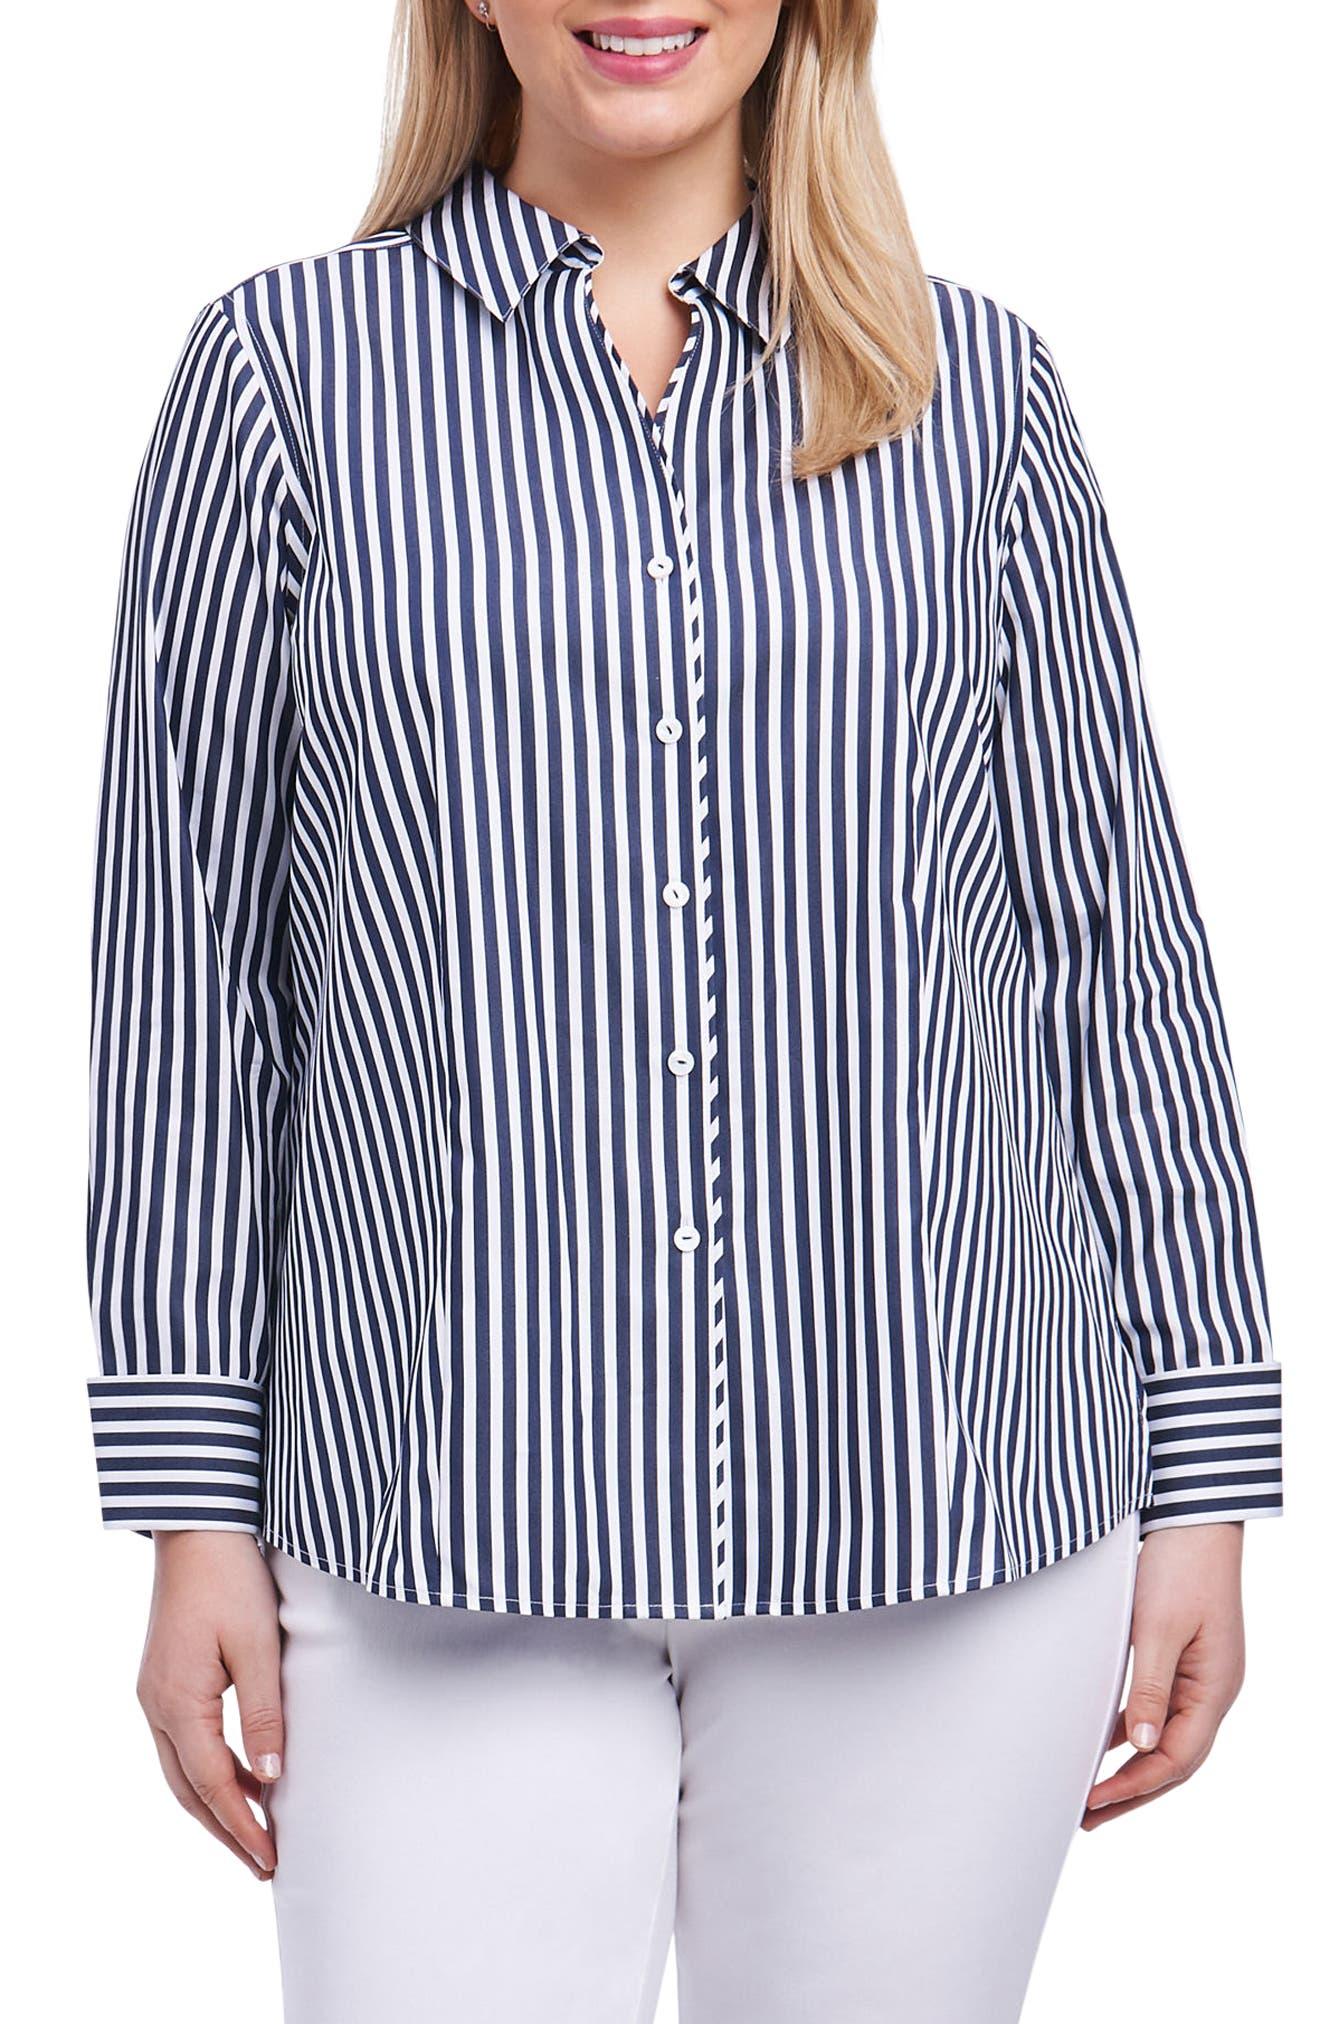 Lauren Sateen Stripe Shirt,                             Main thumbnail 1, color,                             Navy